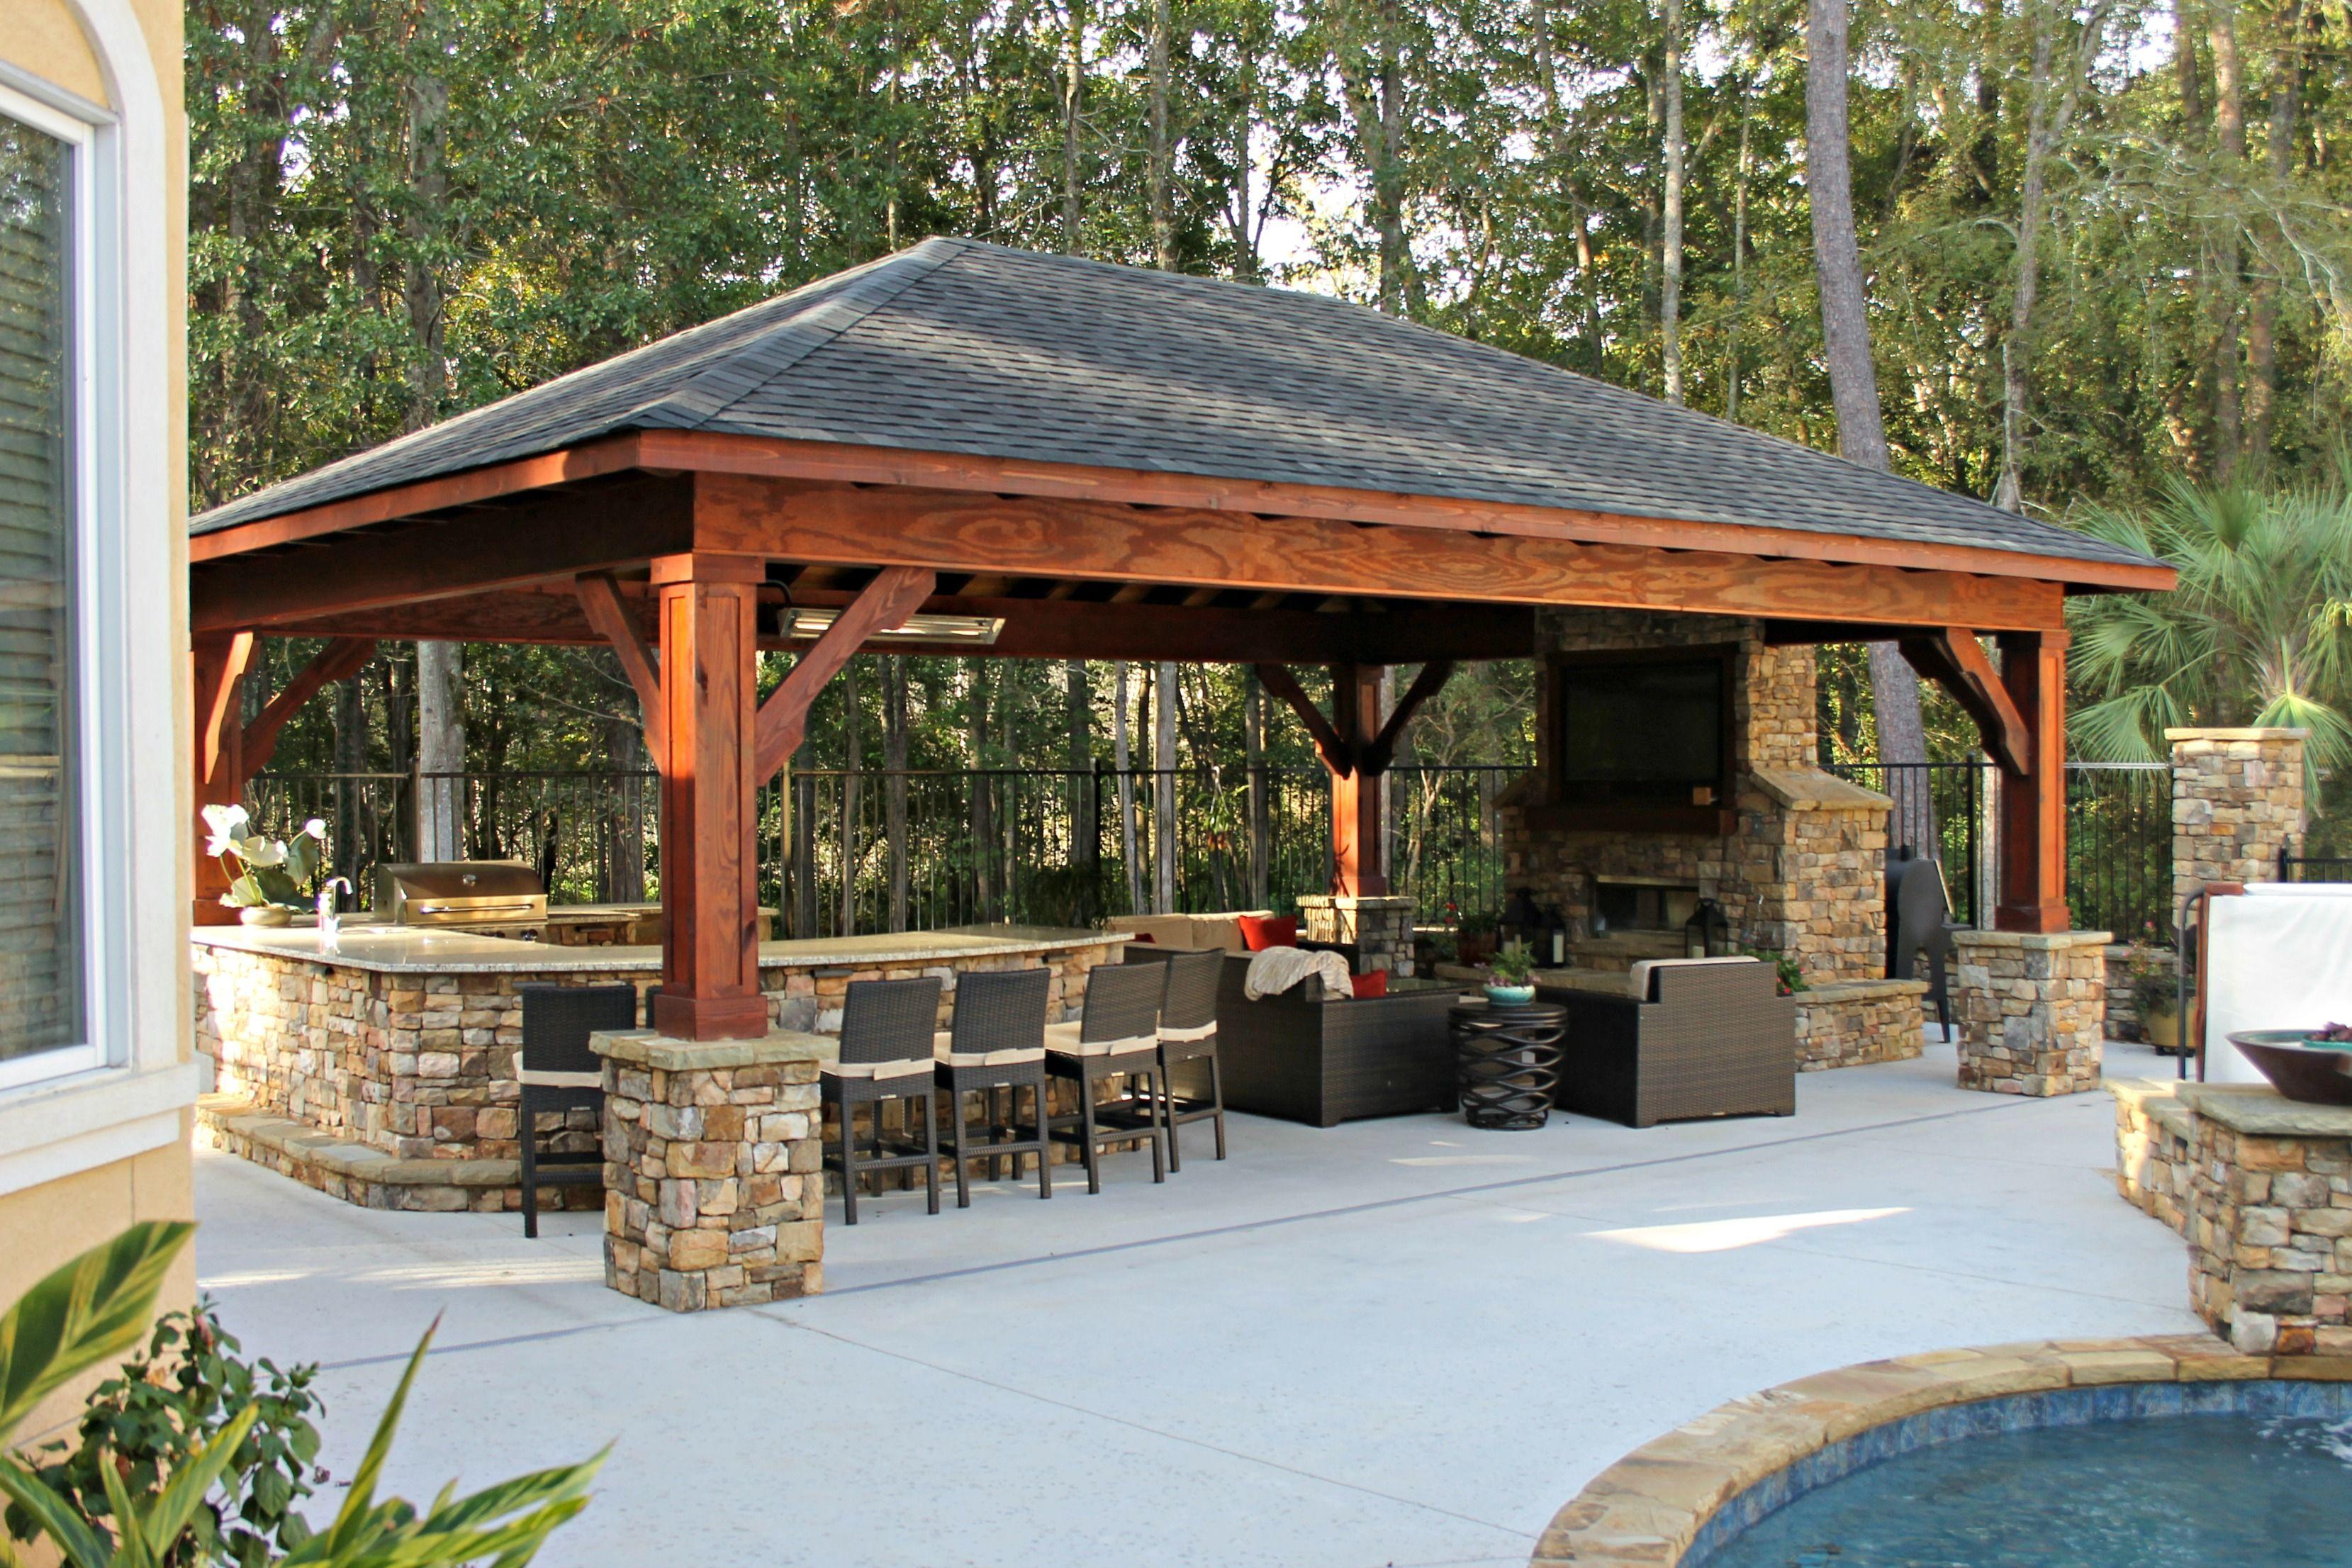 Outdoor Spaces Backyard Pavilion Patio Design Outdoor Kitchen Patio